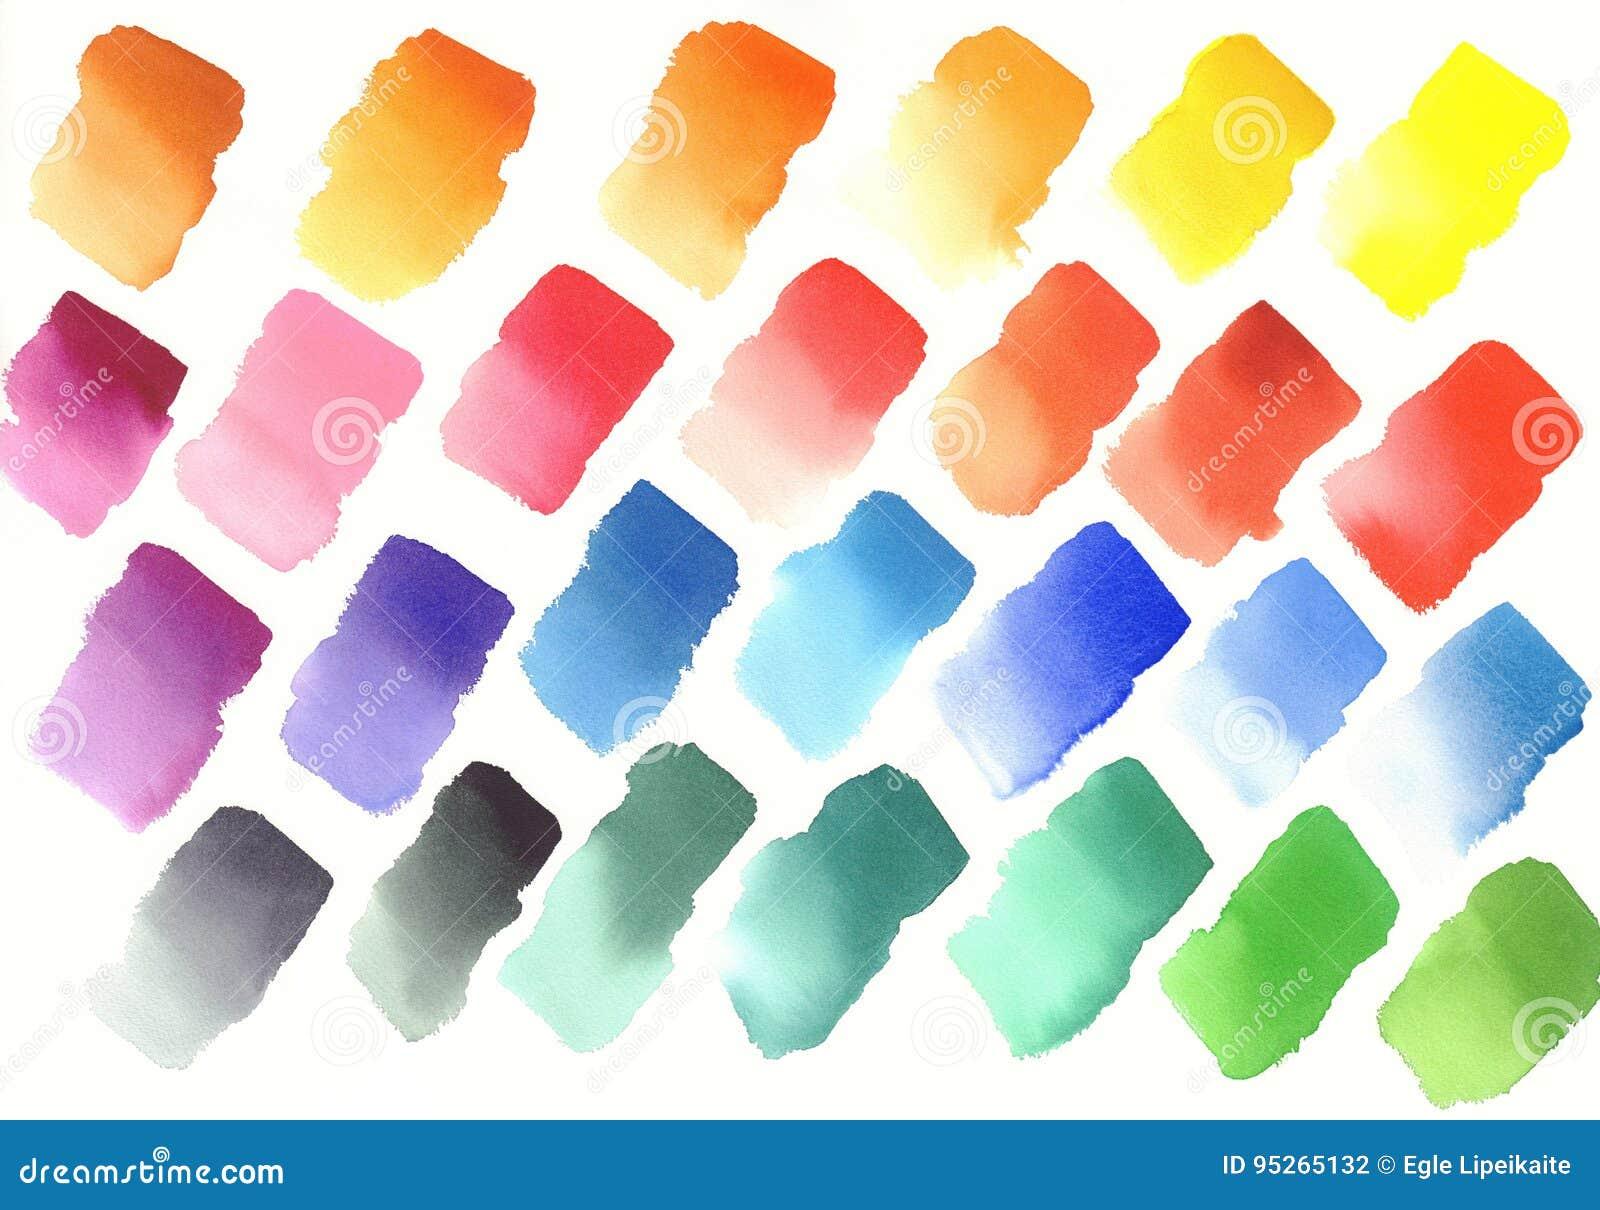 color palette of watercolor paints stock illustration illustration